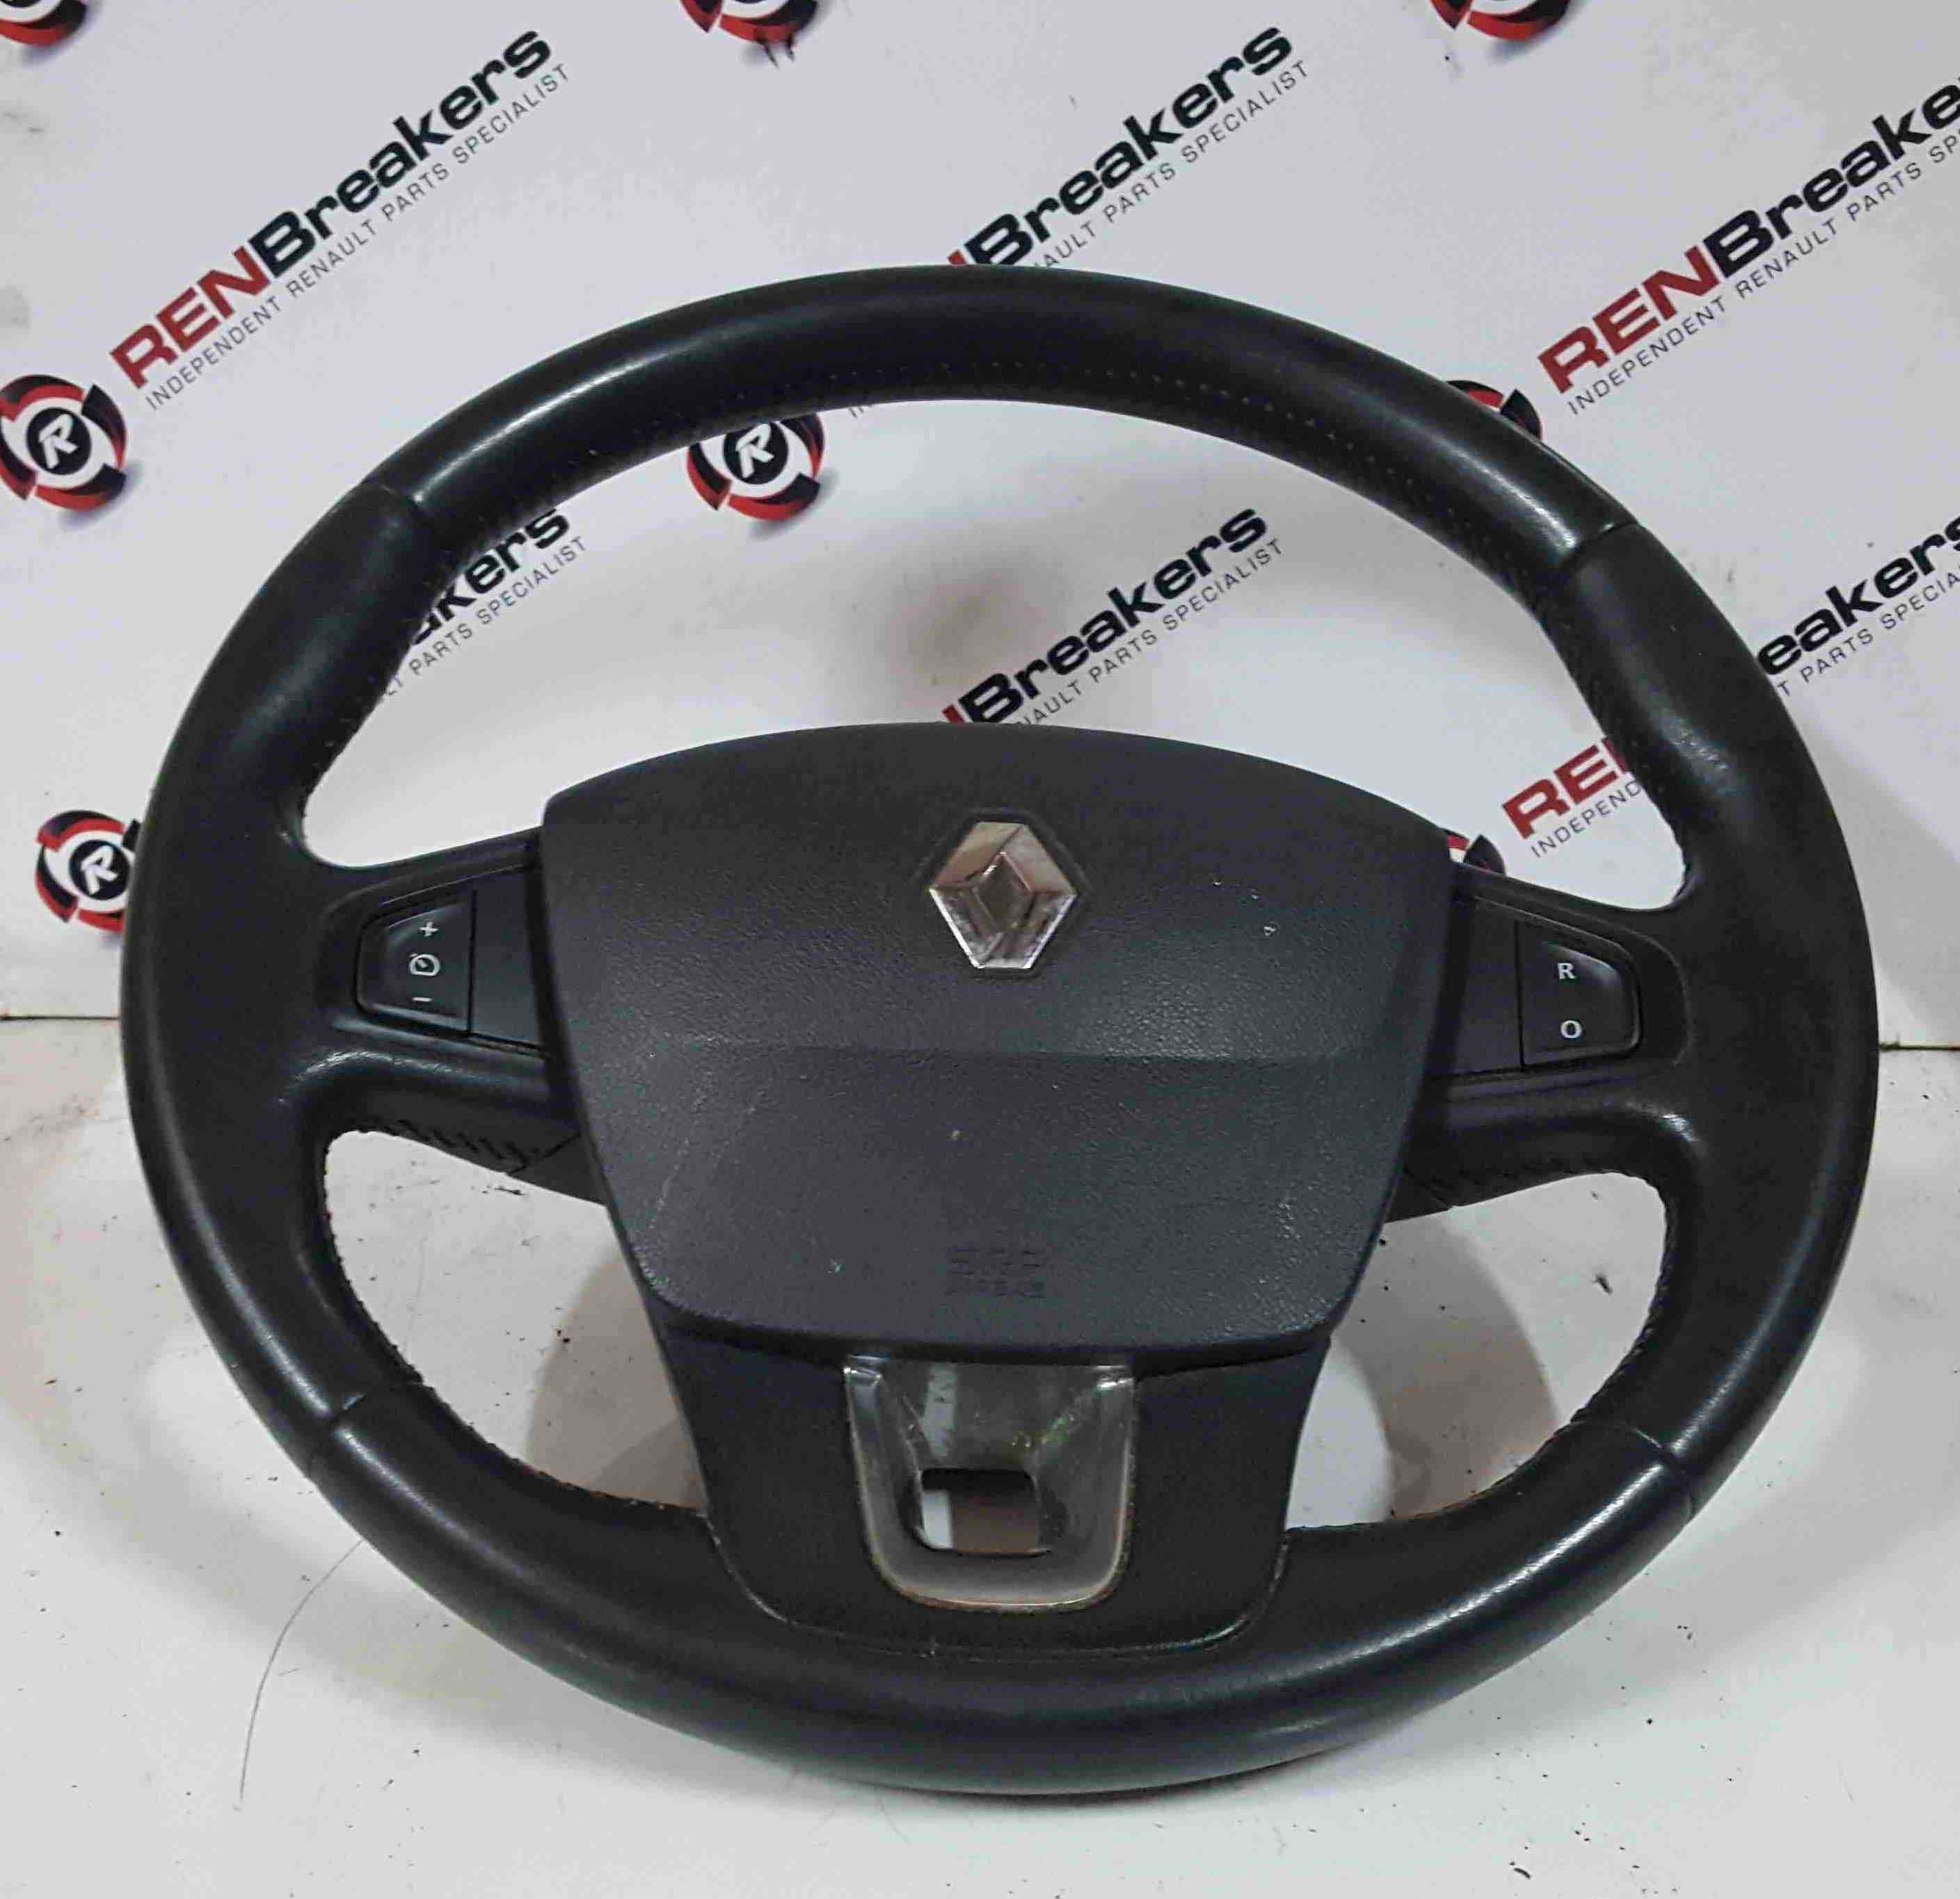 Renault Laguna MK3 2007-2012 Steering Wheel Airbag Cruise Control